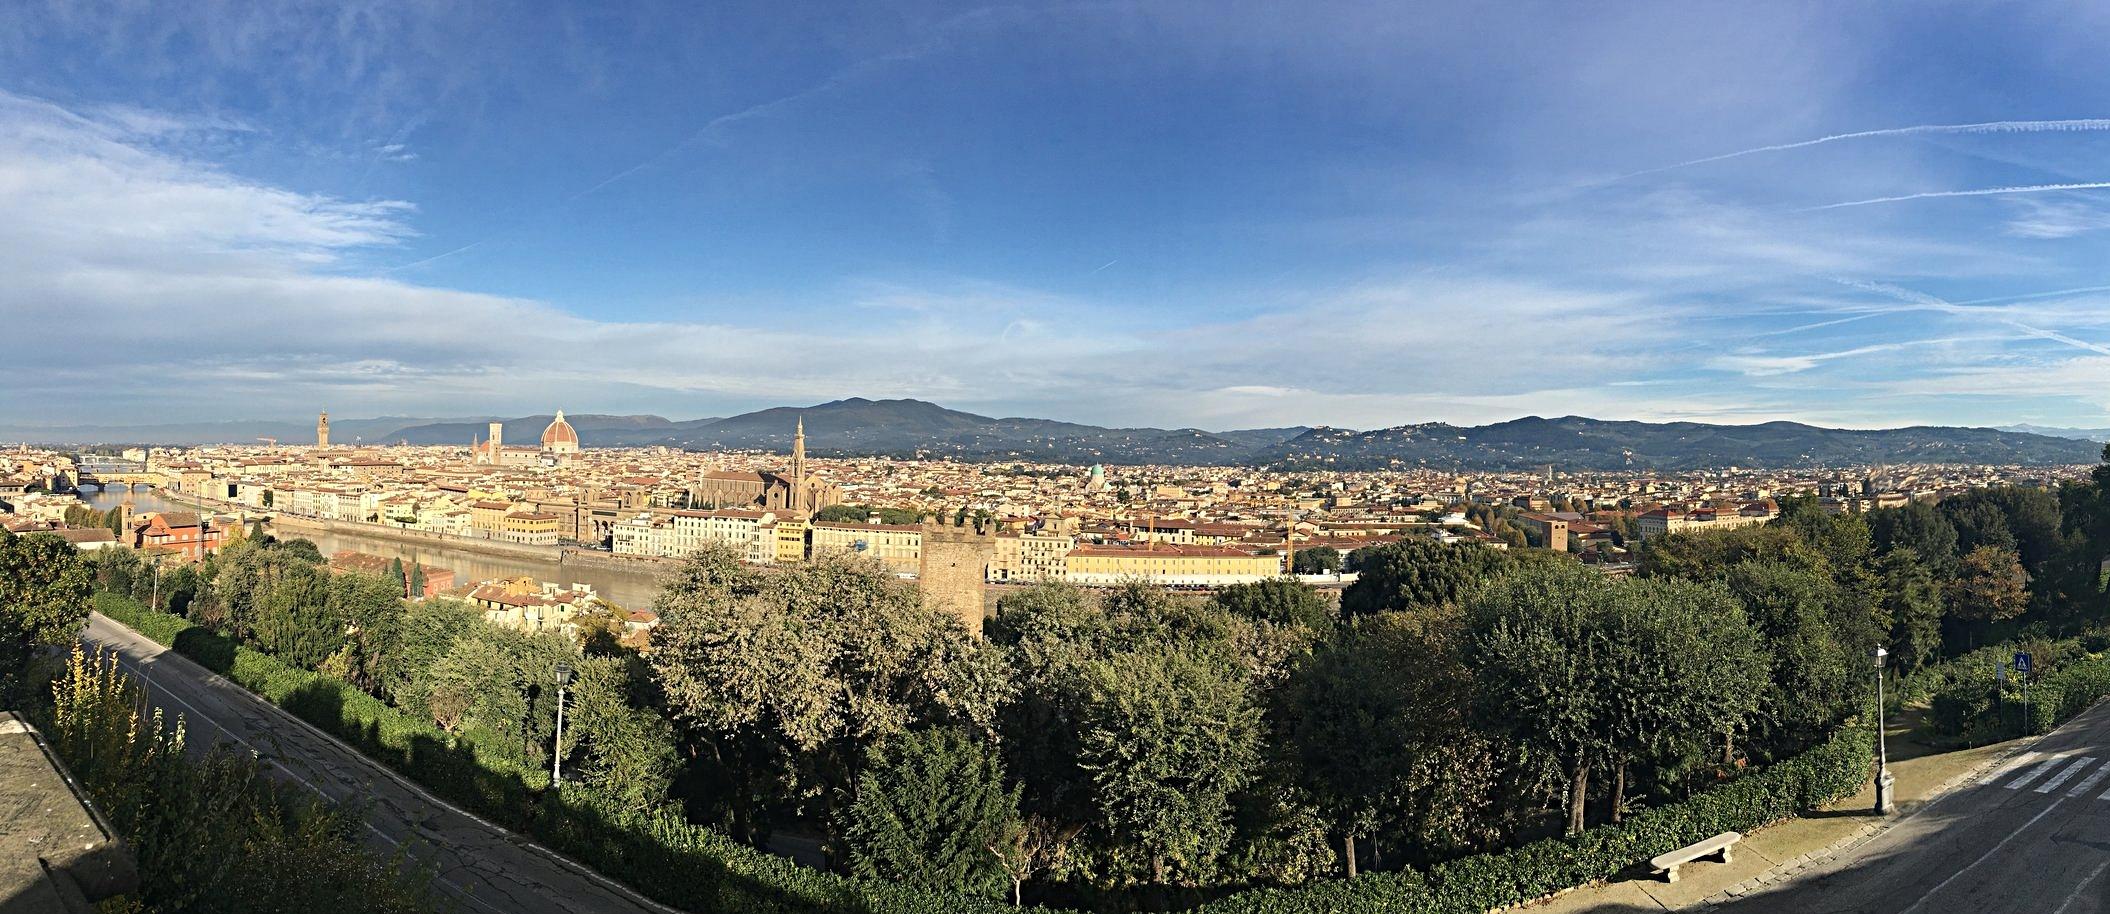 Vista panorâmica da cidade na Praça Michelângelo.